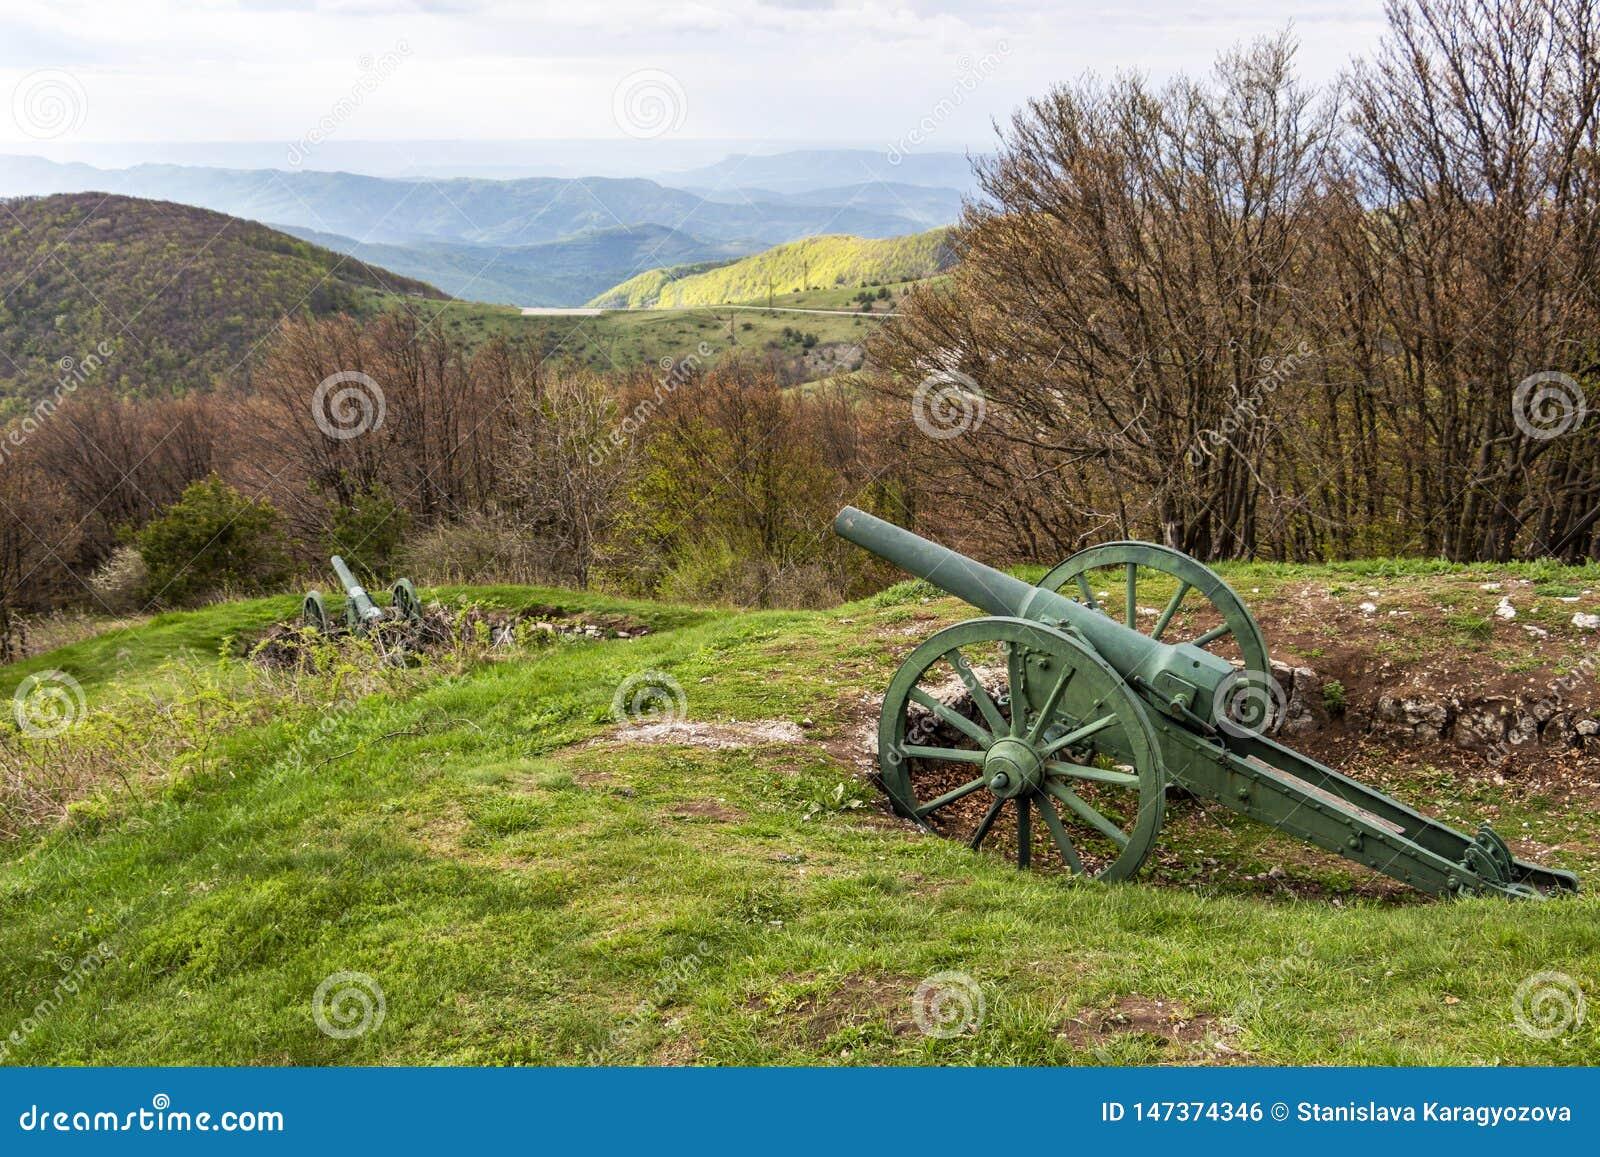 Пик Shipka, балканские горы, Болгария